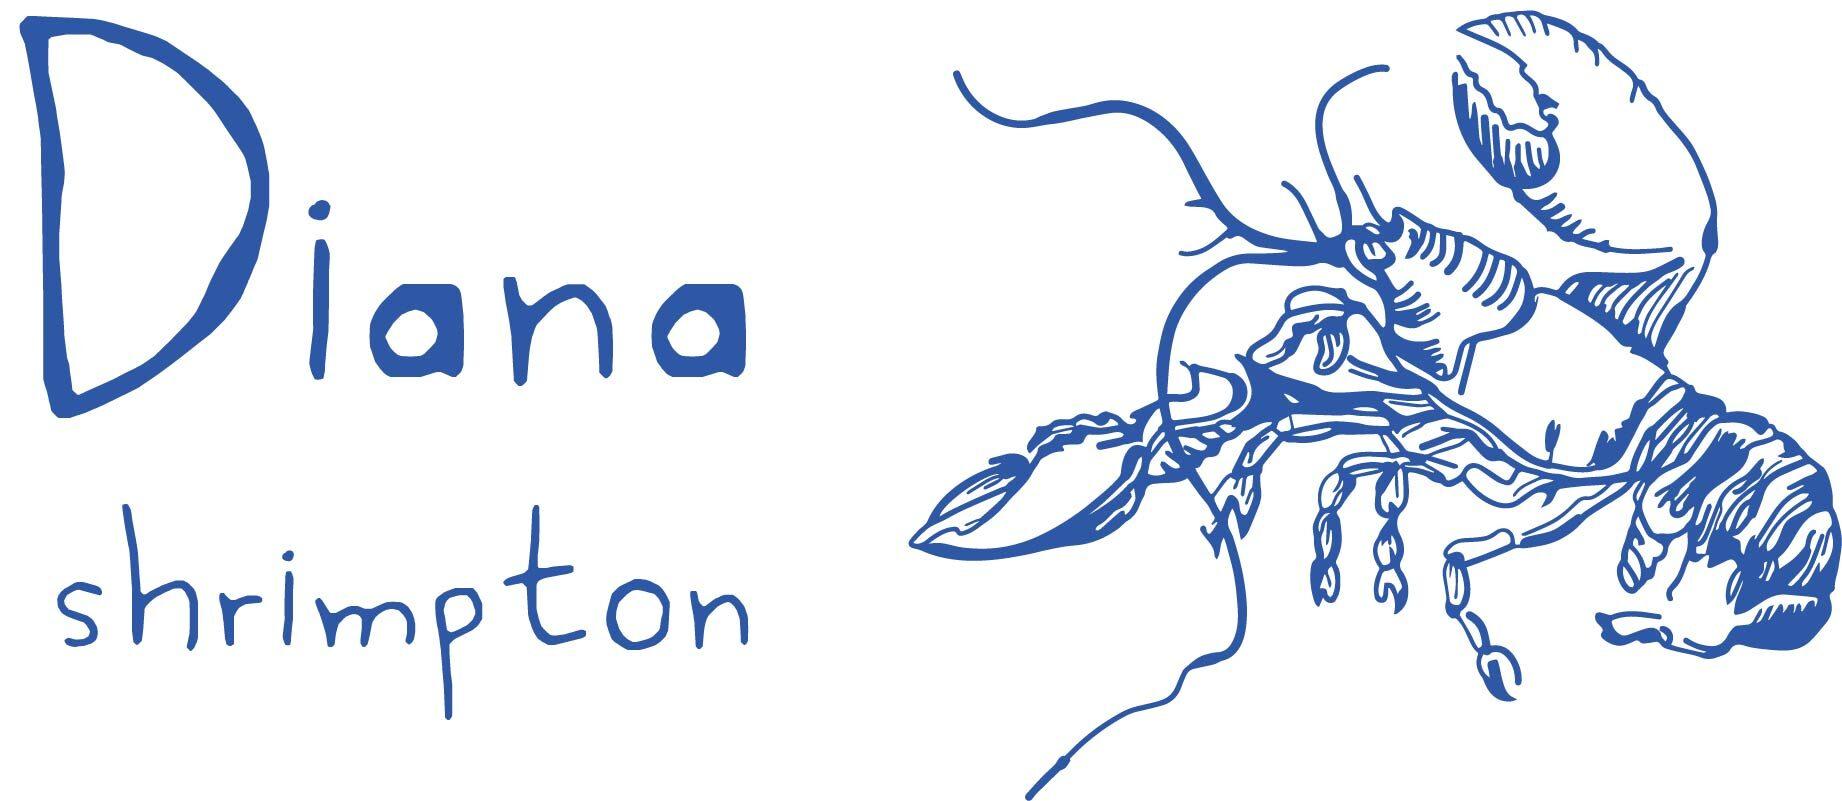 Diana Shrimpton